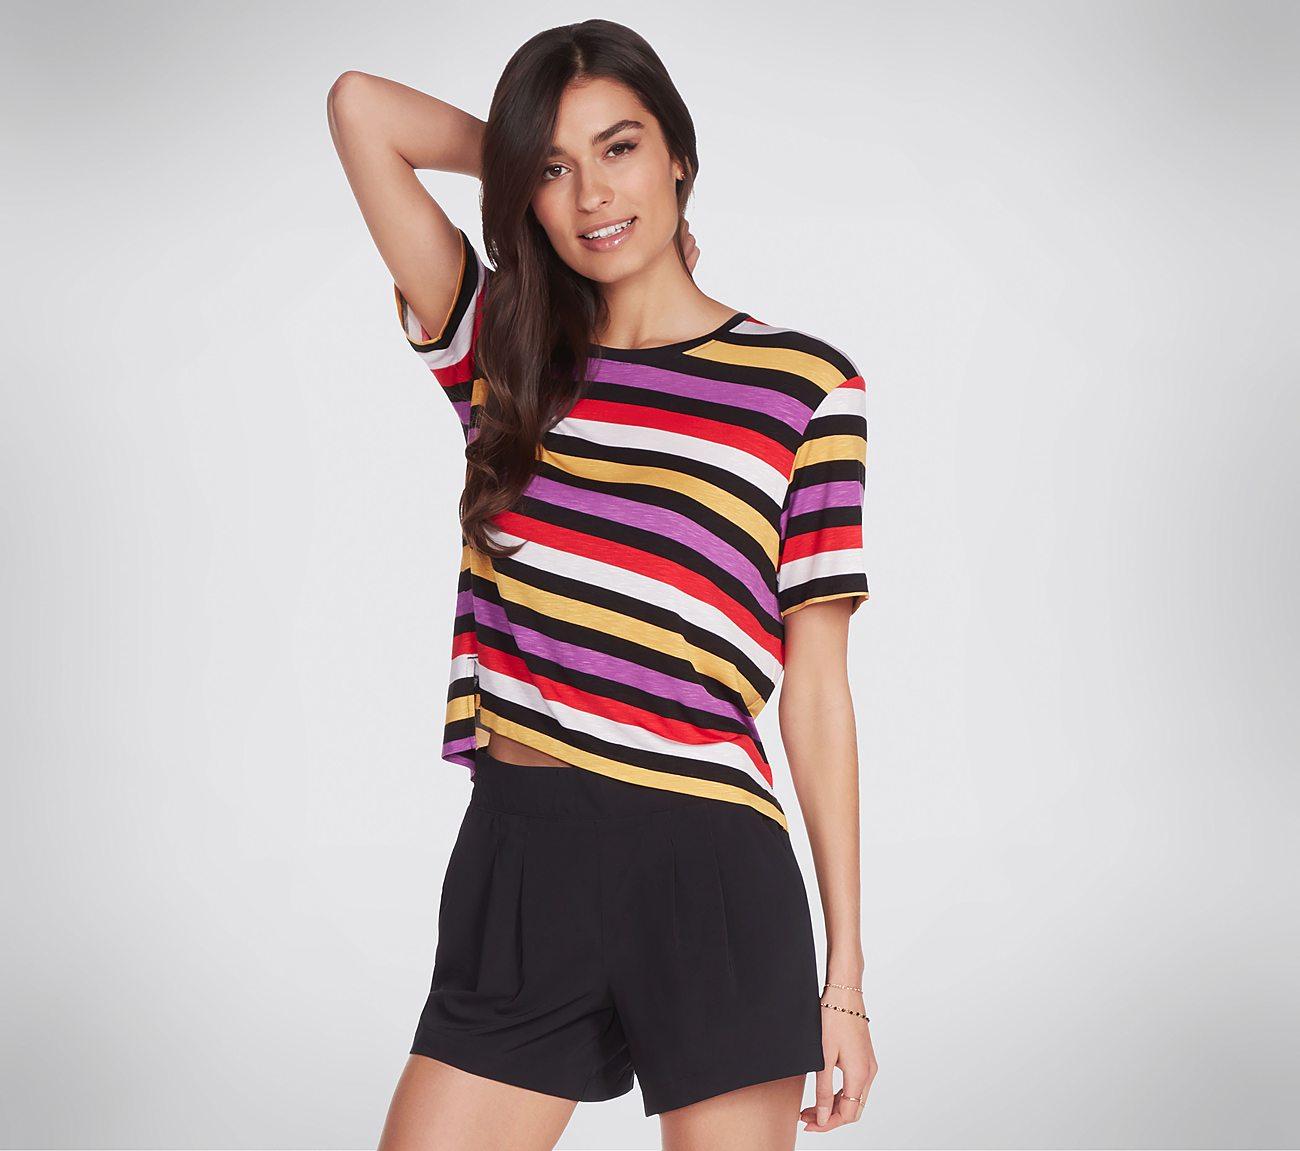 Skechers Apparel Encounter Stripe Tee Shirt